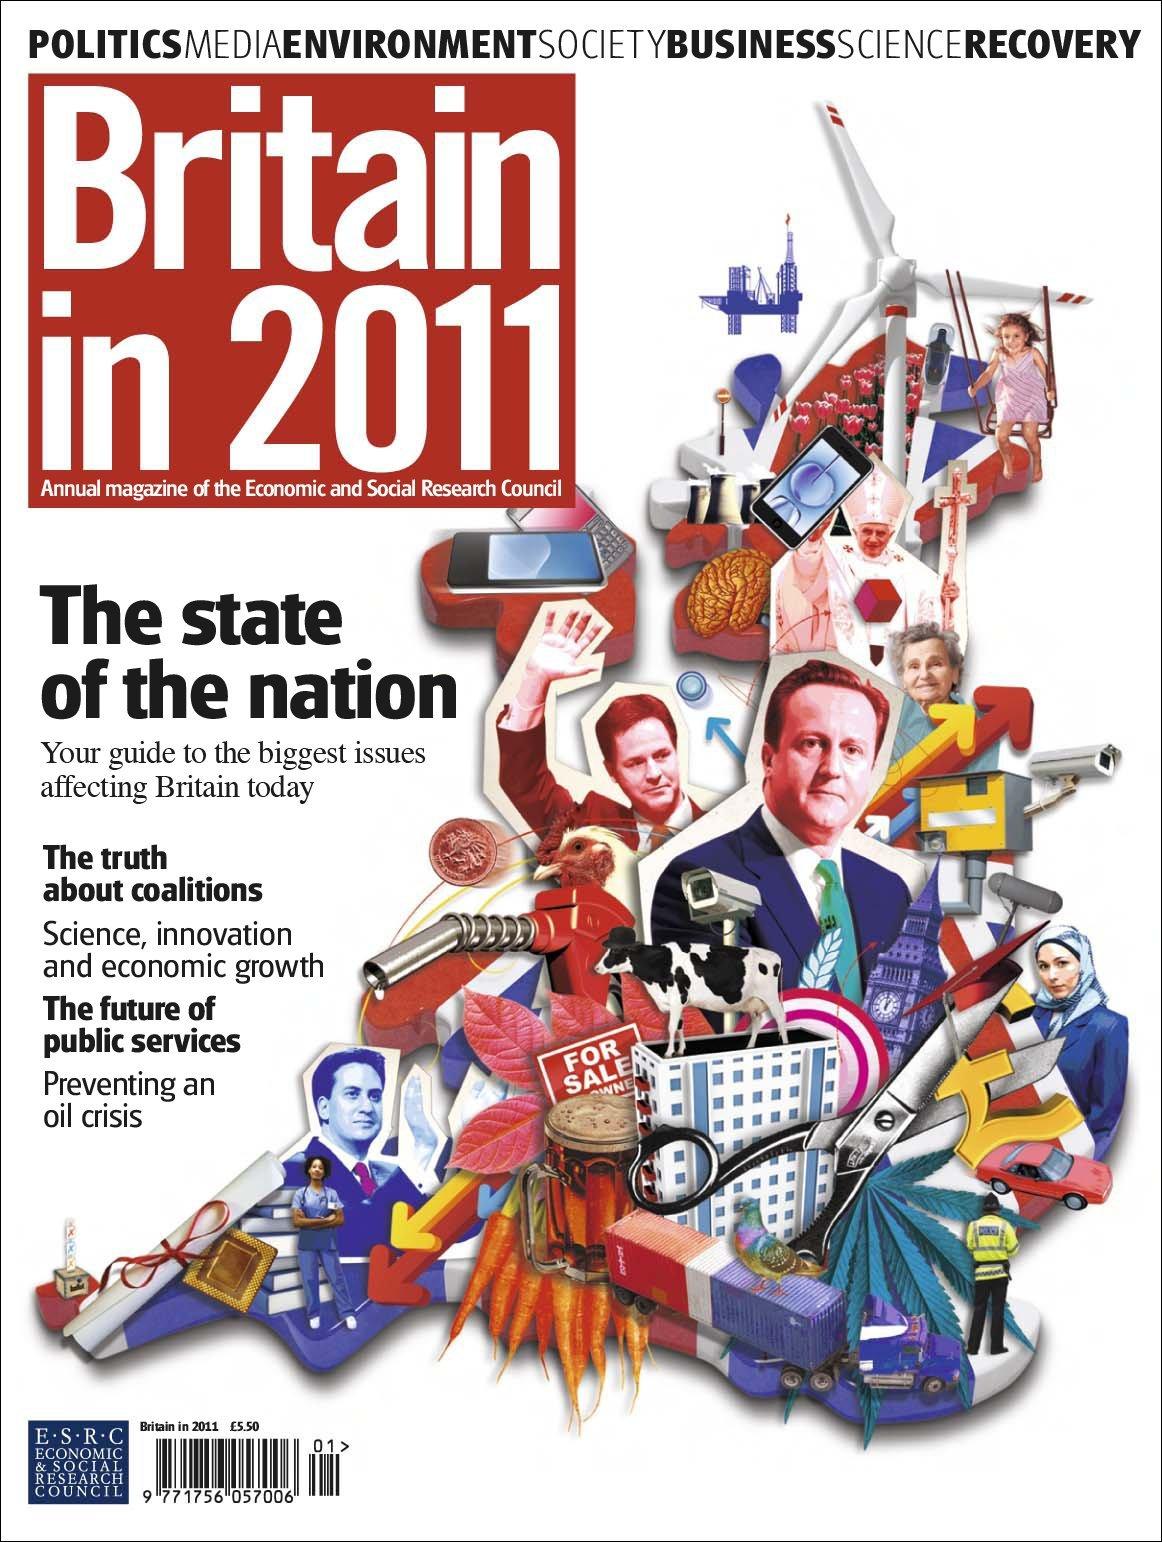 Britain in 2011 Digital